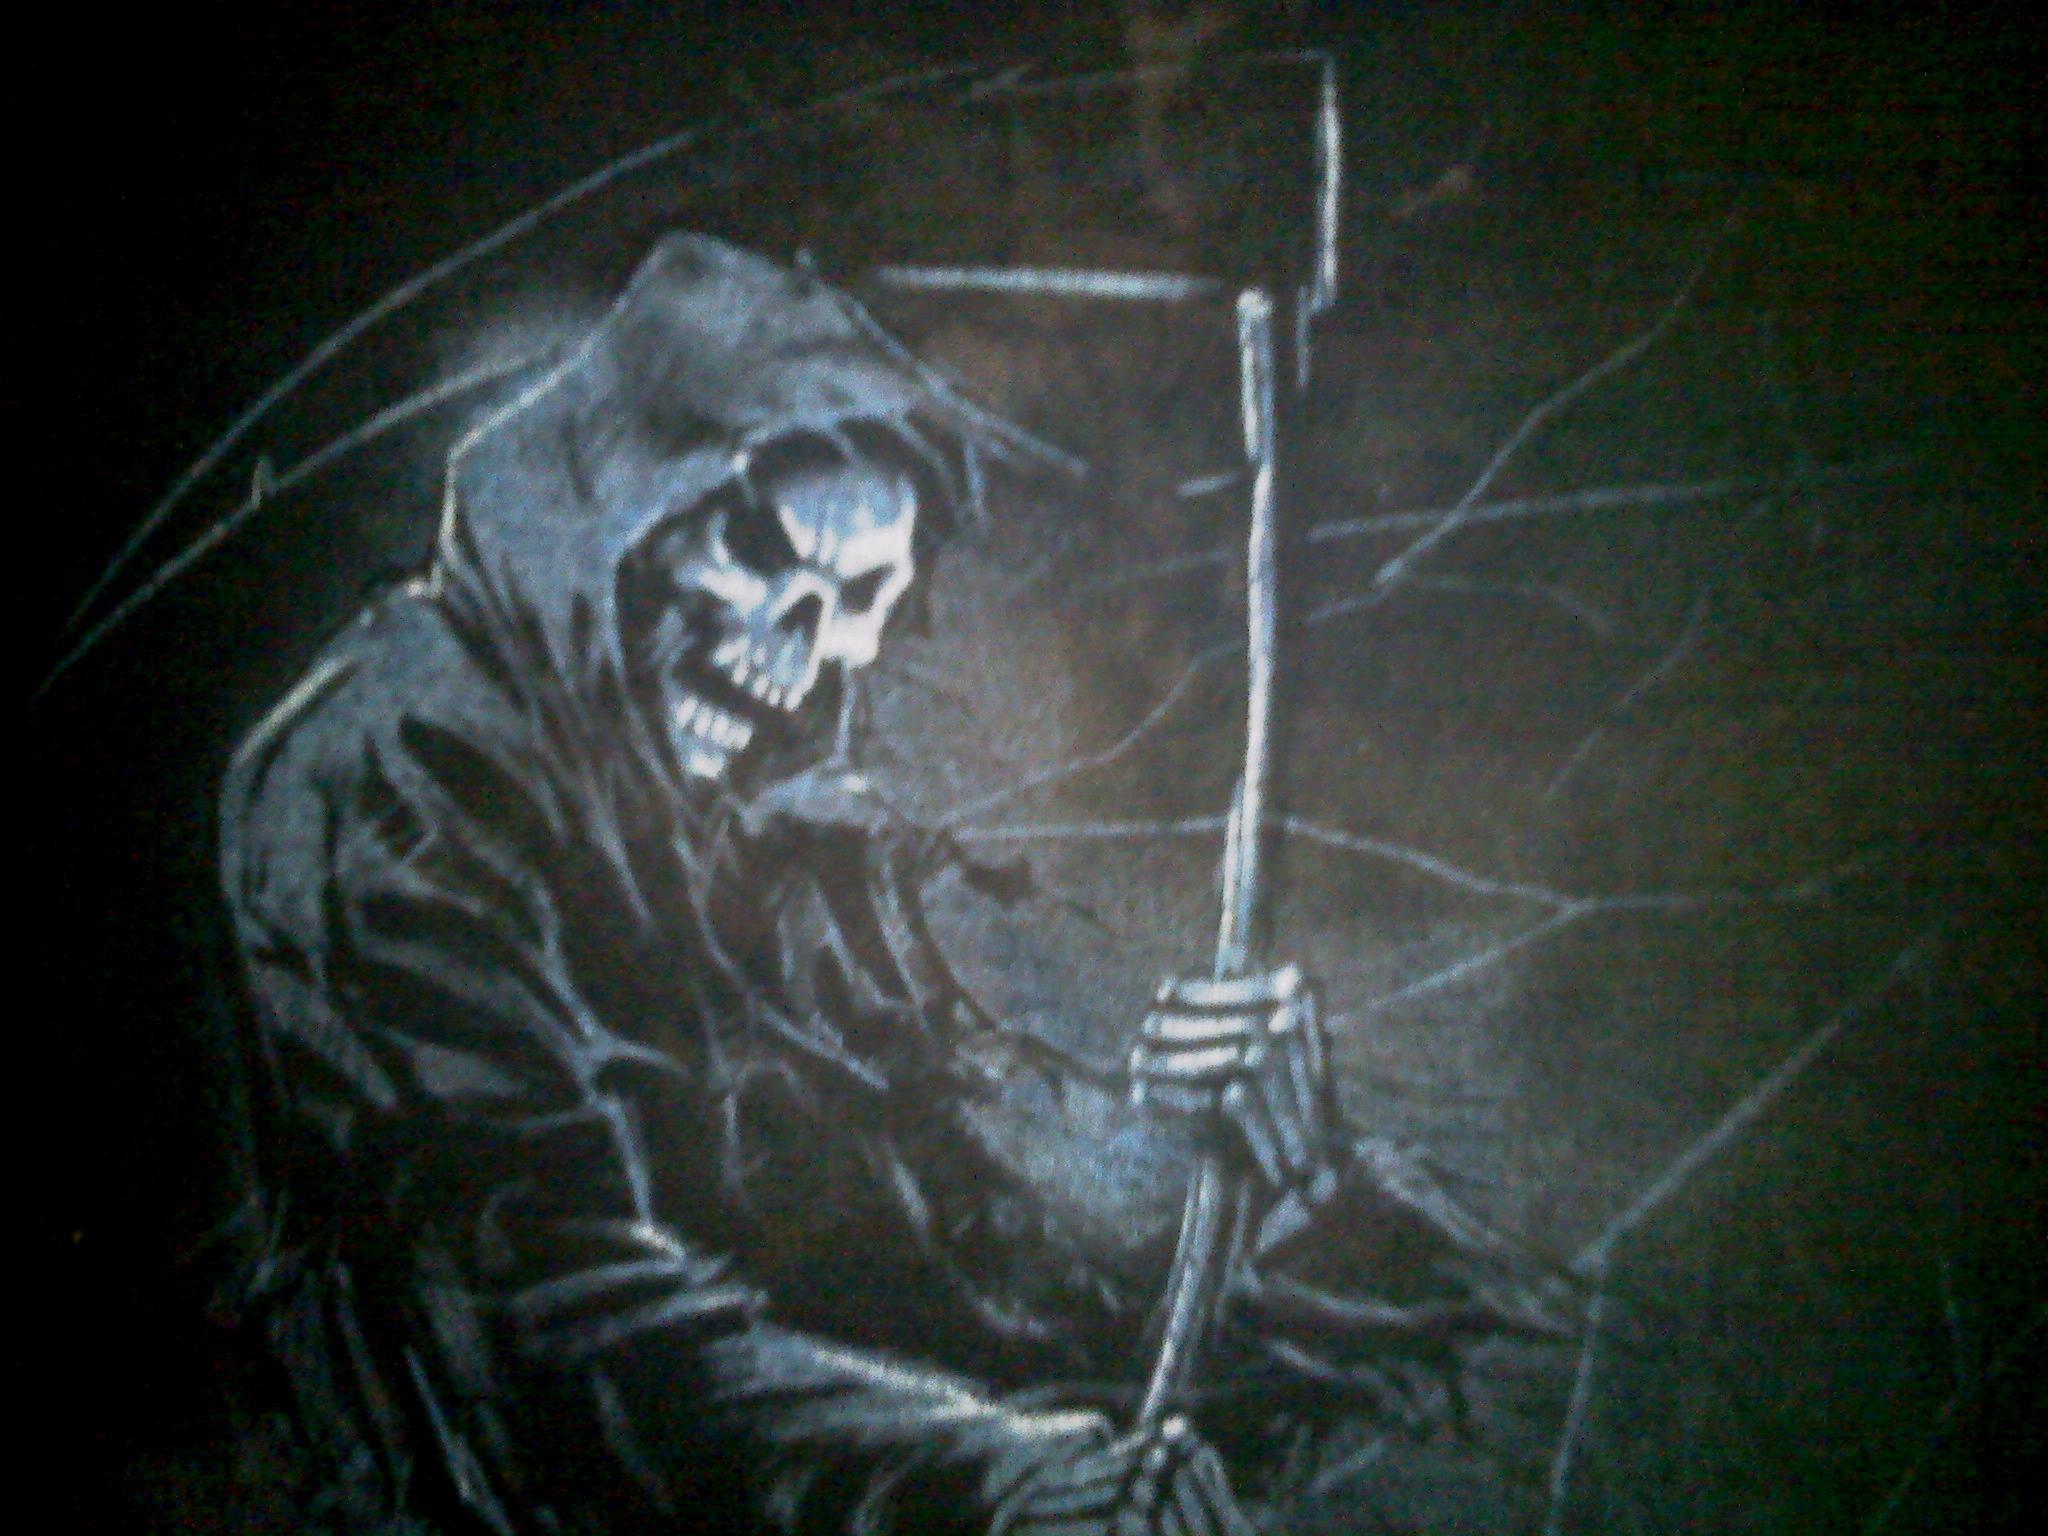 the grim reaper images Grim reaper HD wallpaper and 2048x1536